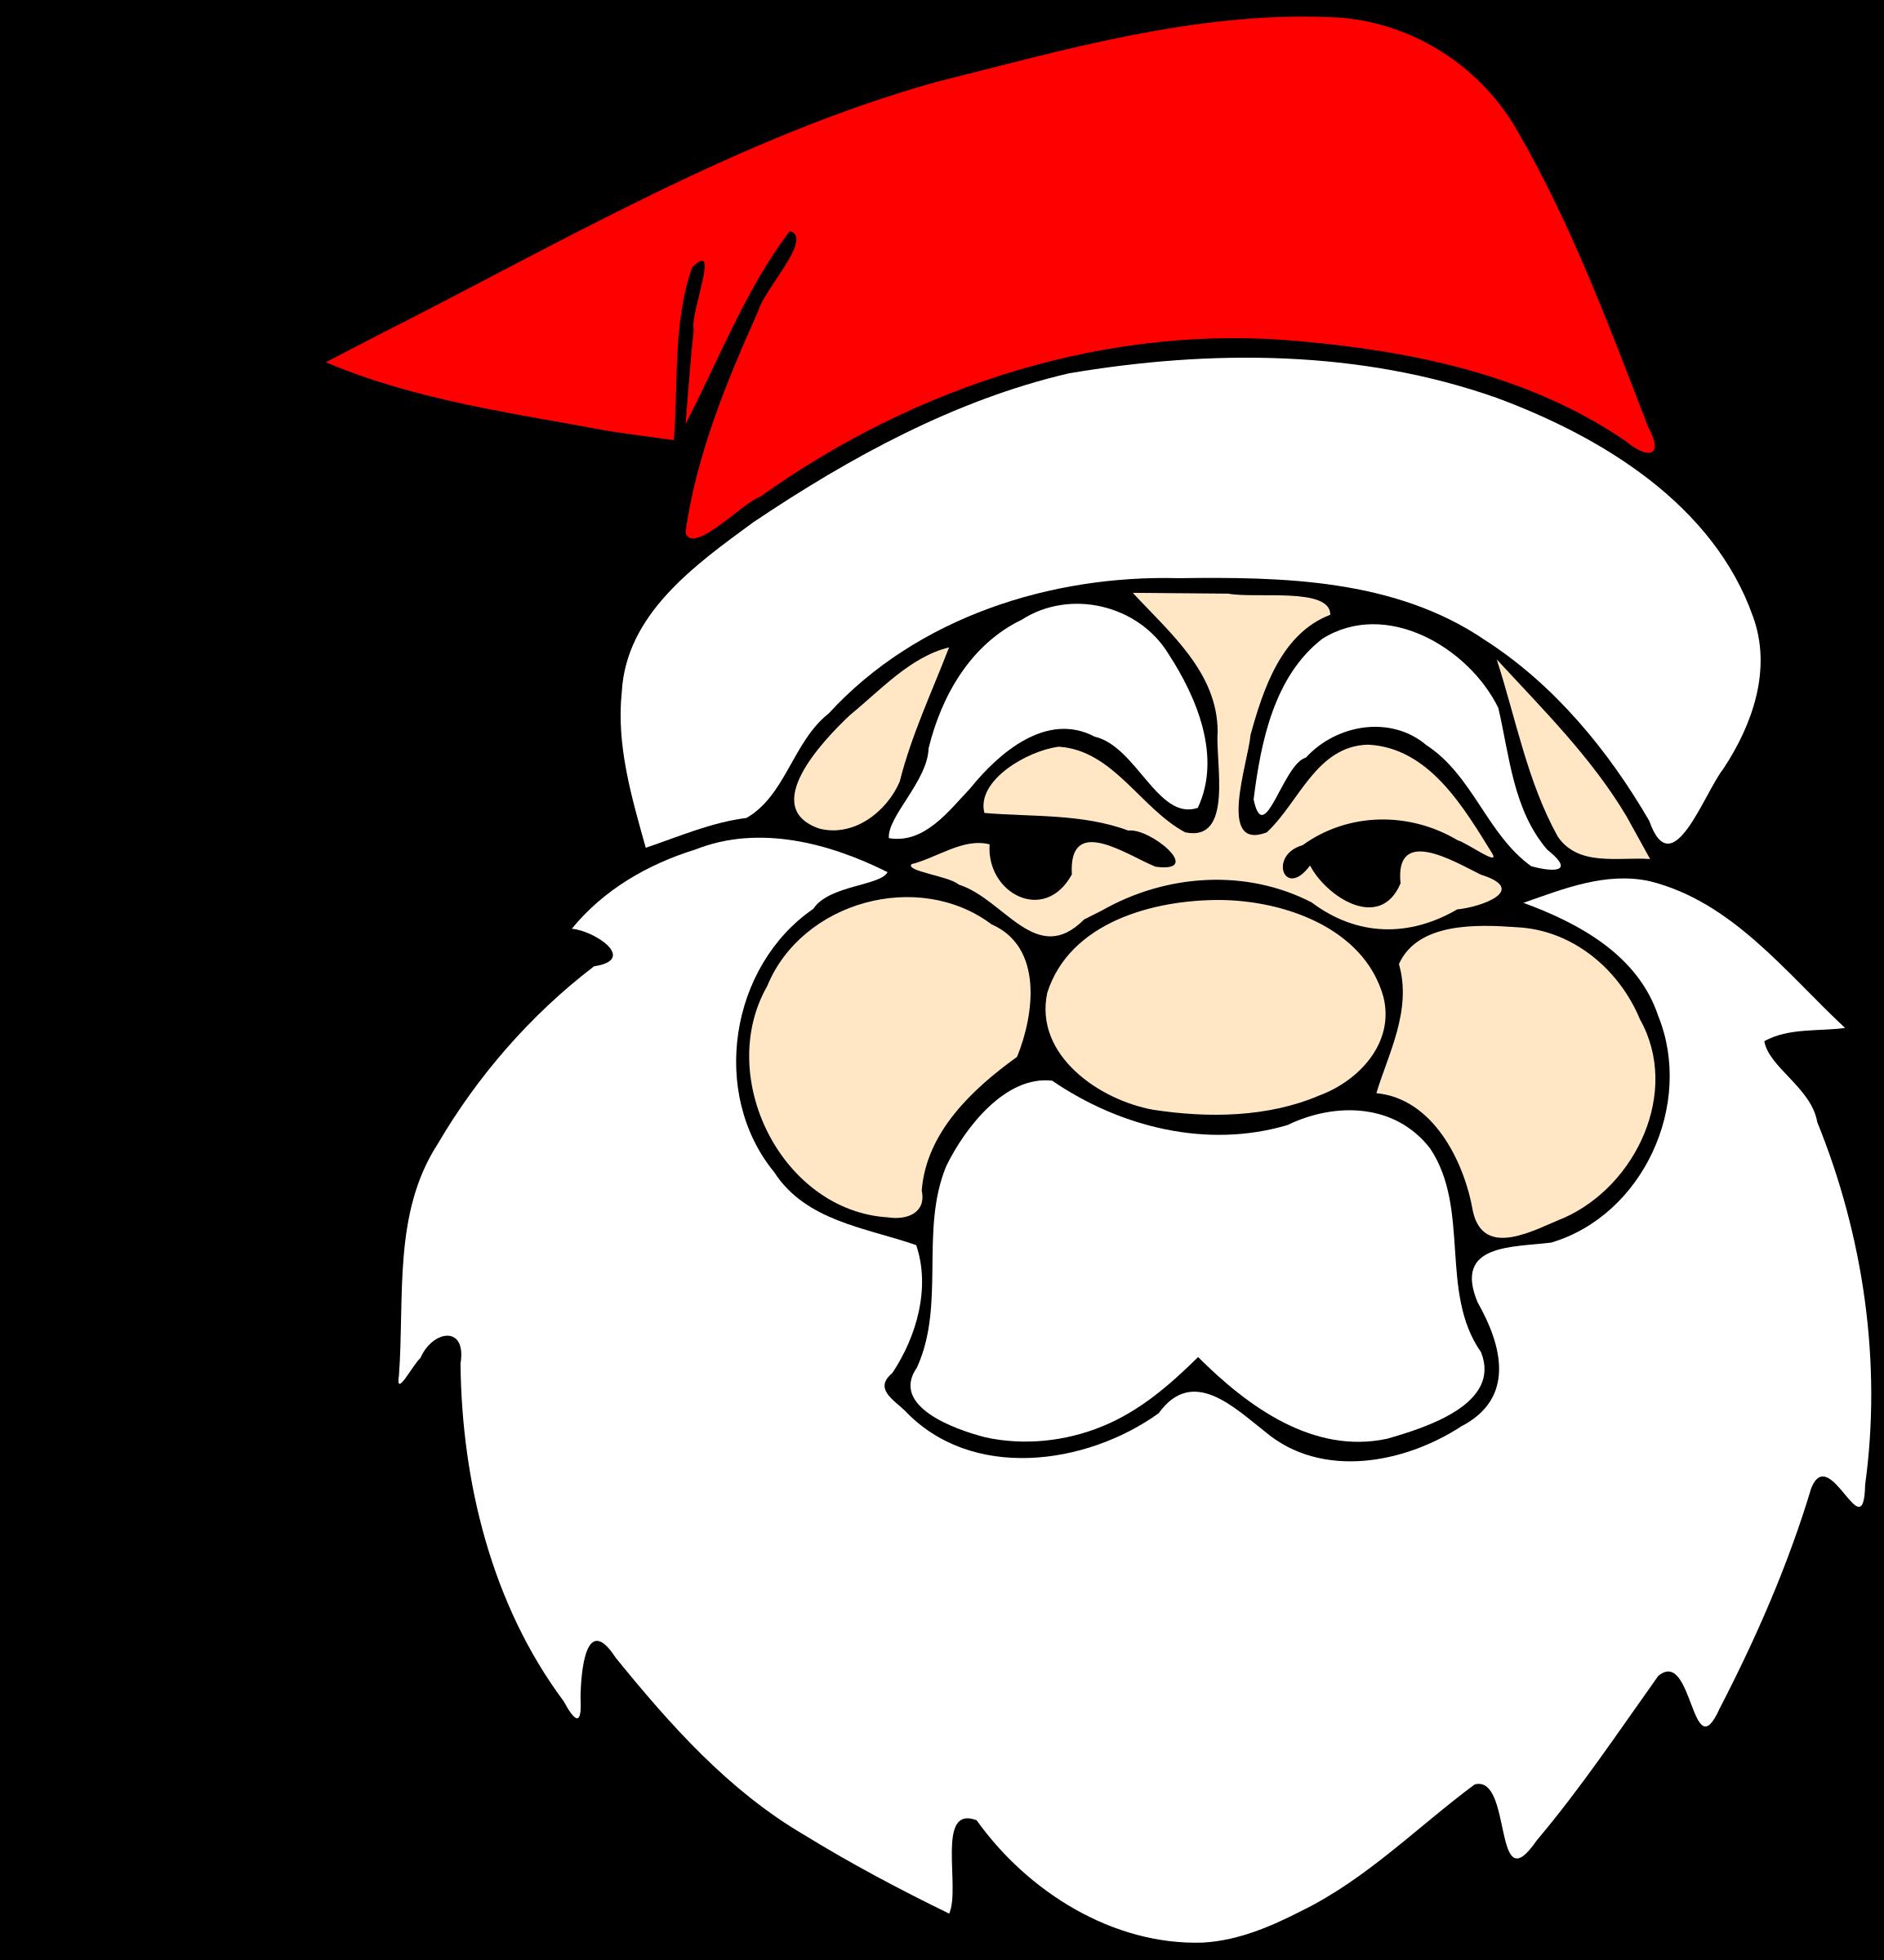 Santa big image png. Mask clipart line art